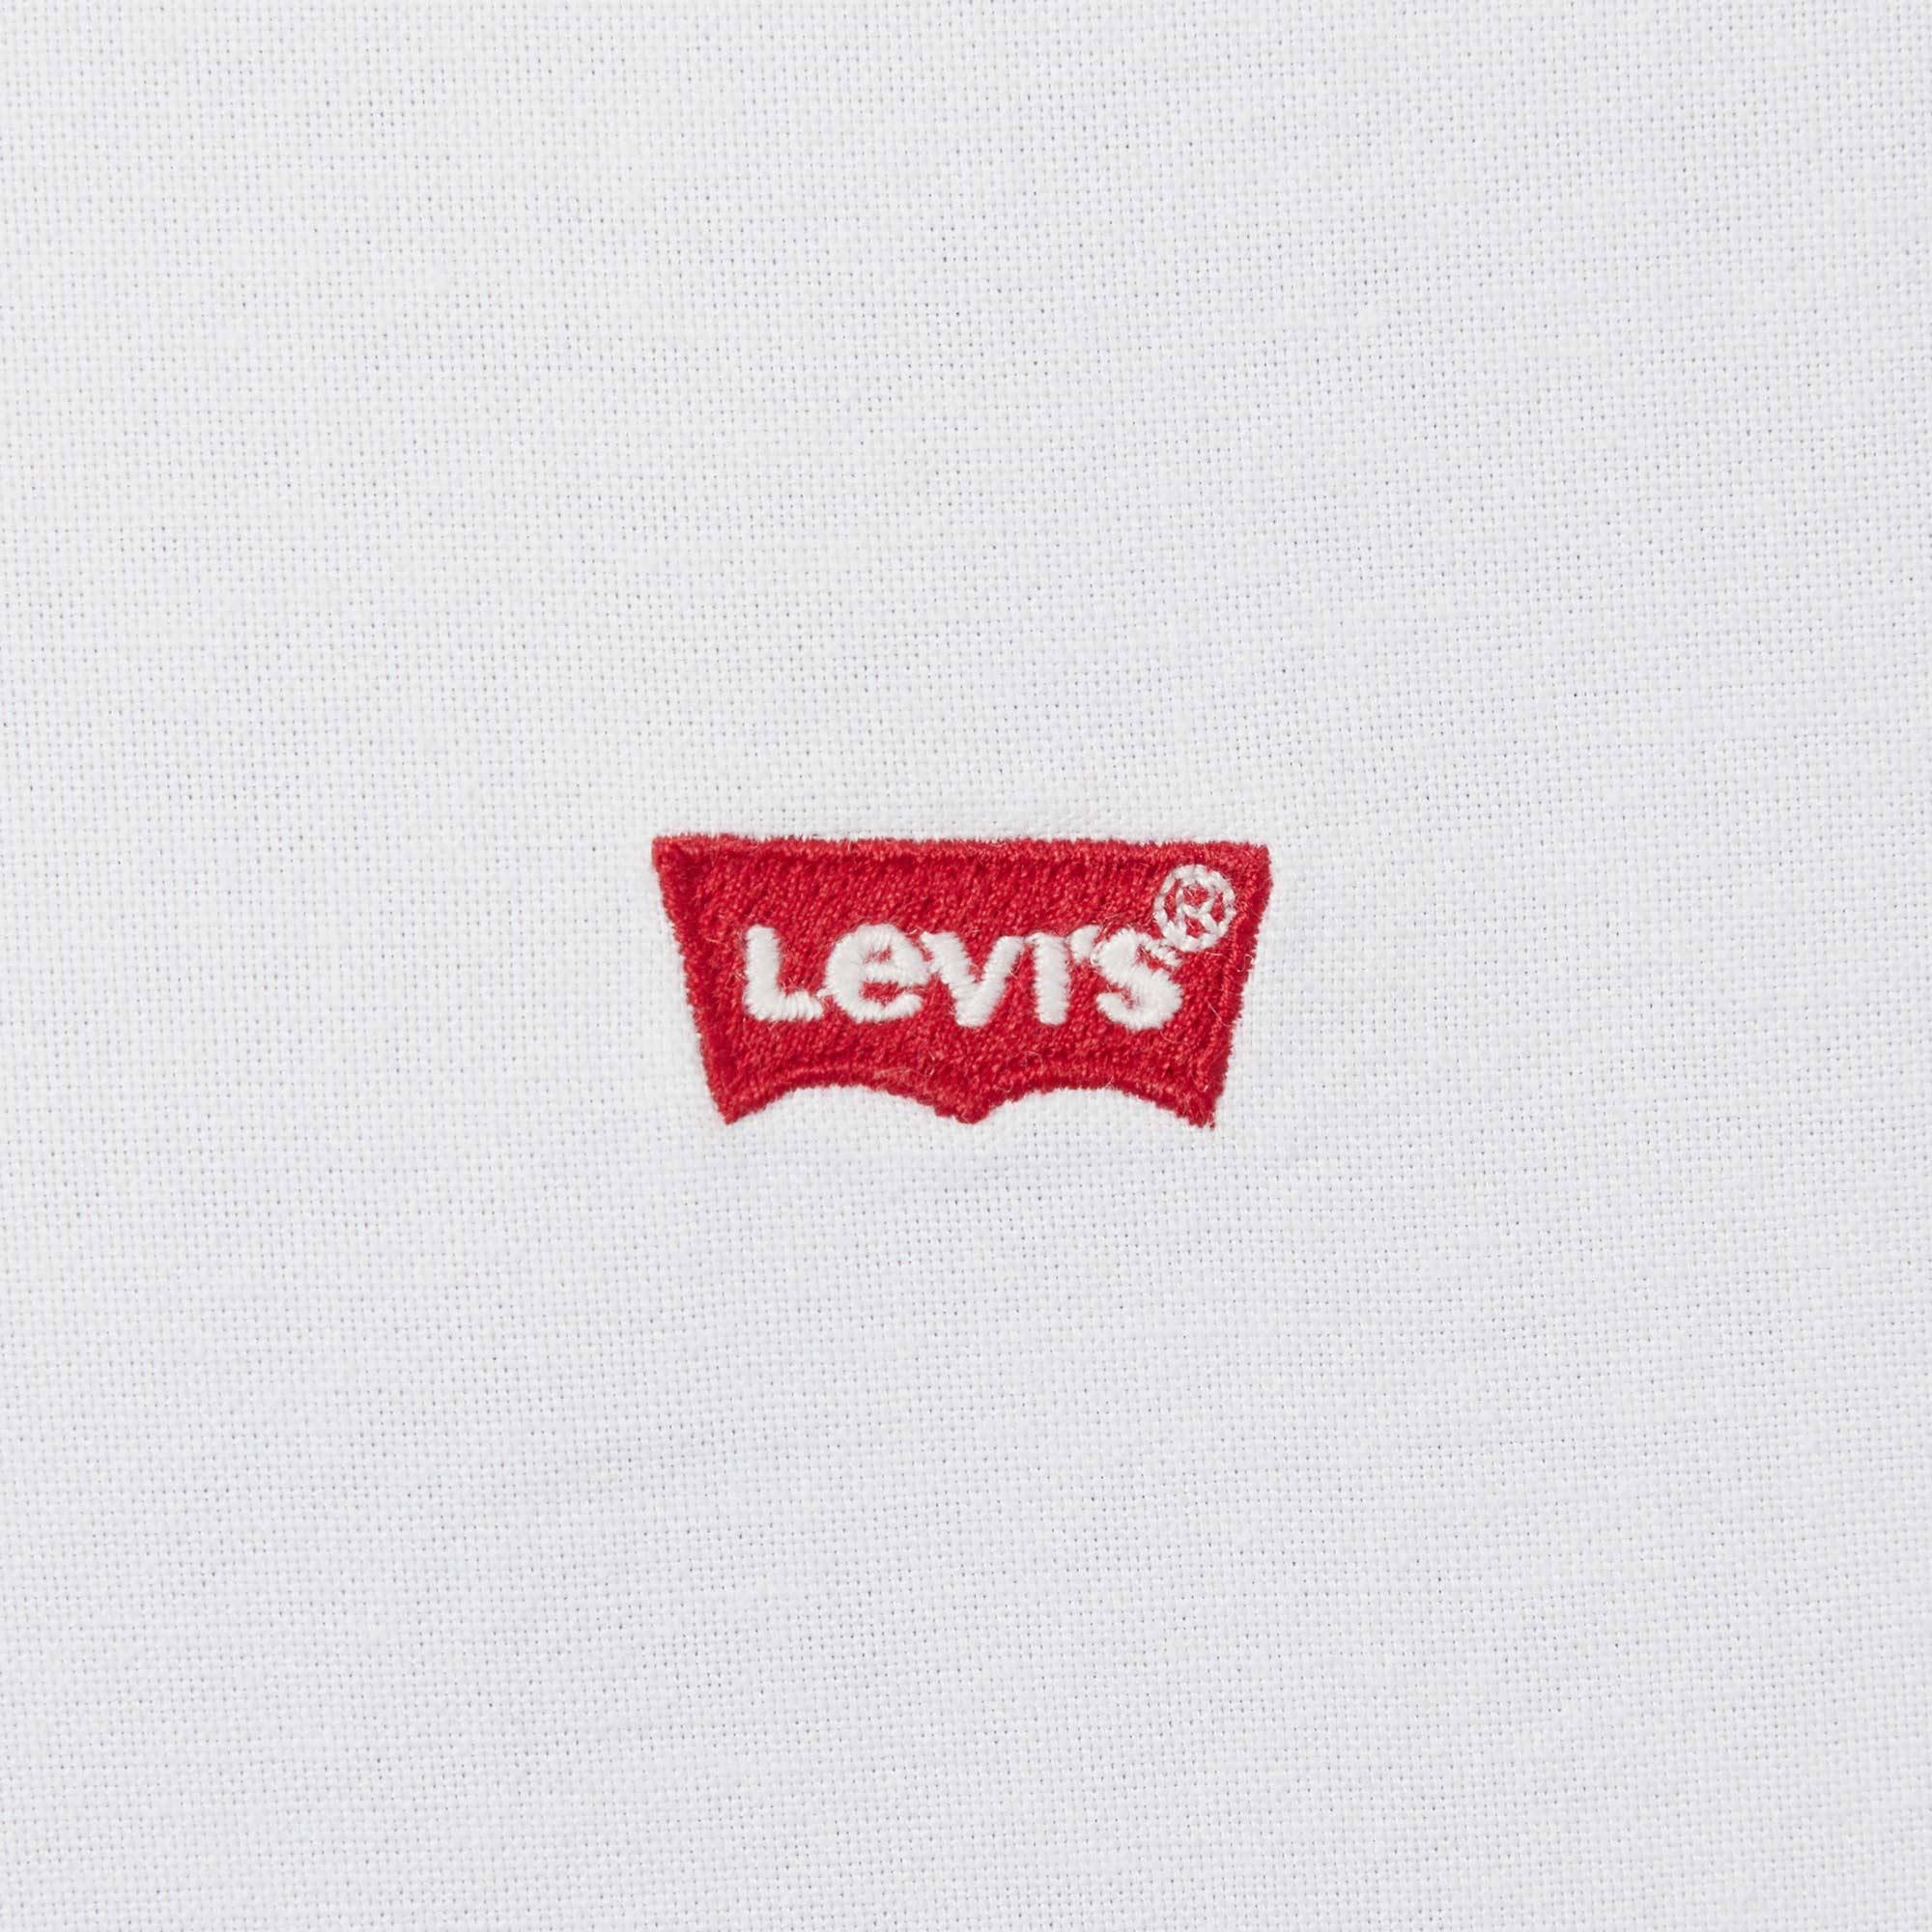 Ls White Housemark Housemark Ls White Levi's White Levi's Housemark Levi's Ls qwR1vCE